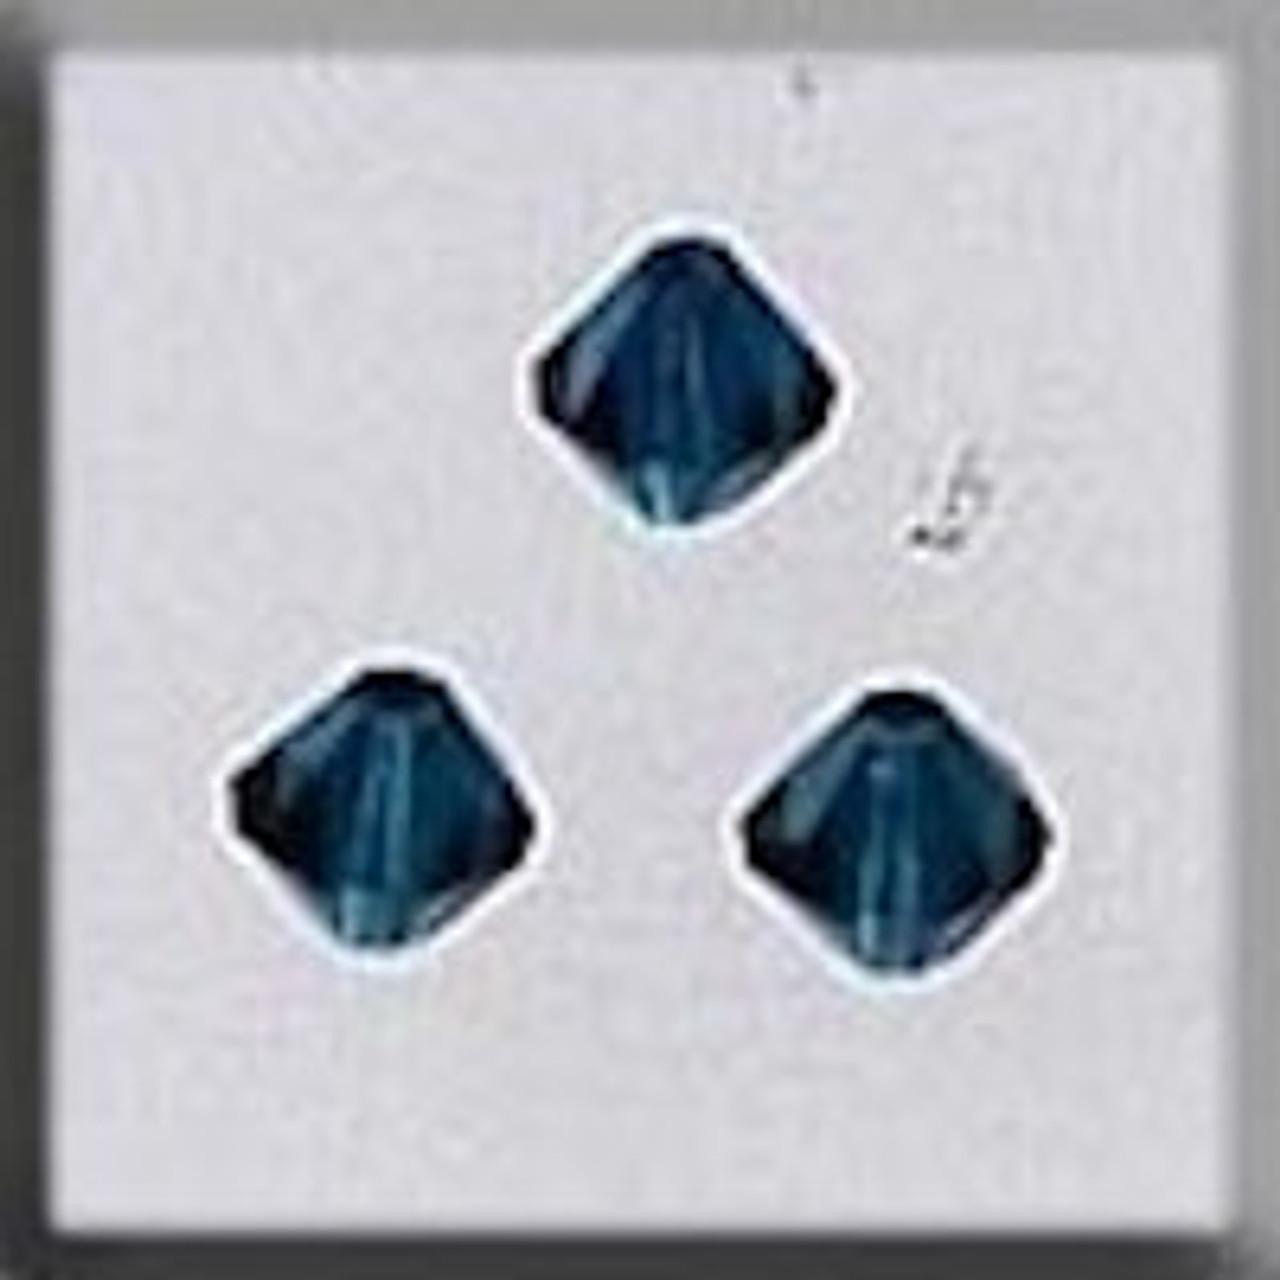 Mill Hill Crystal Treasures - Rondele Emerald